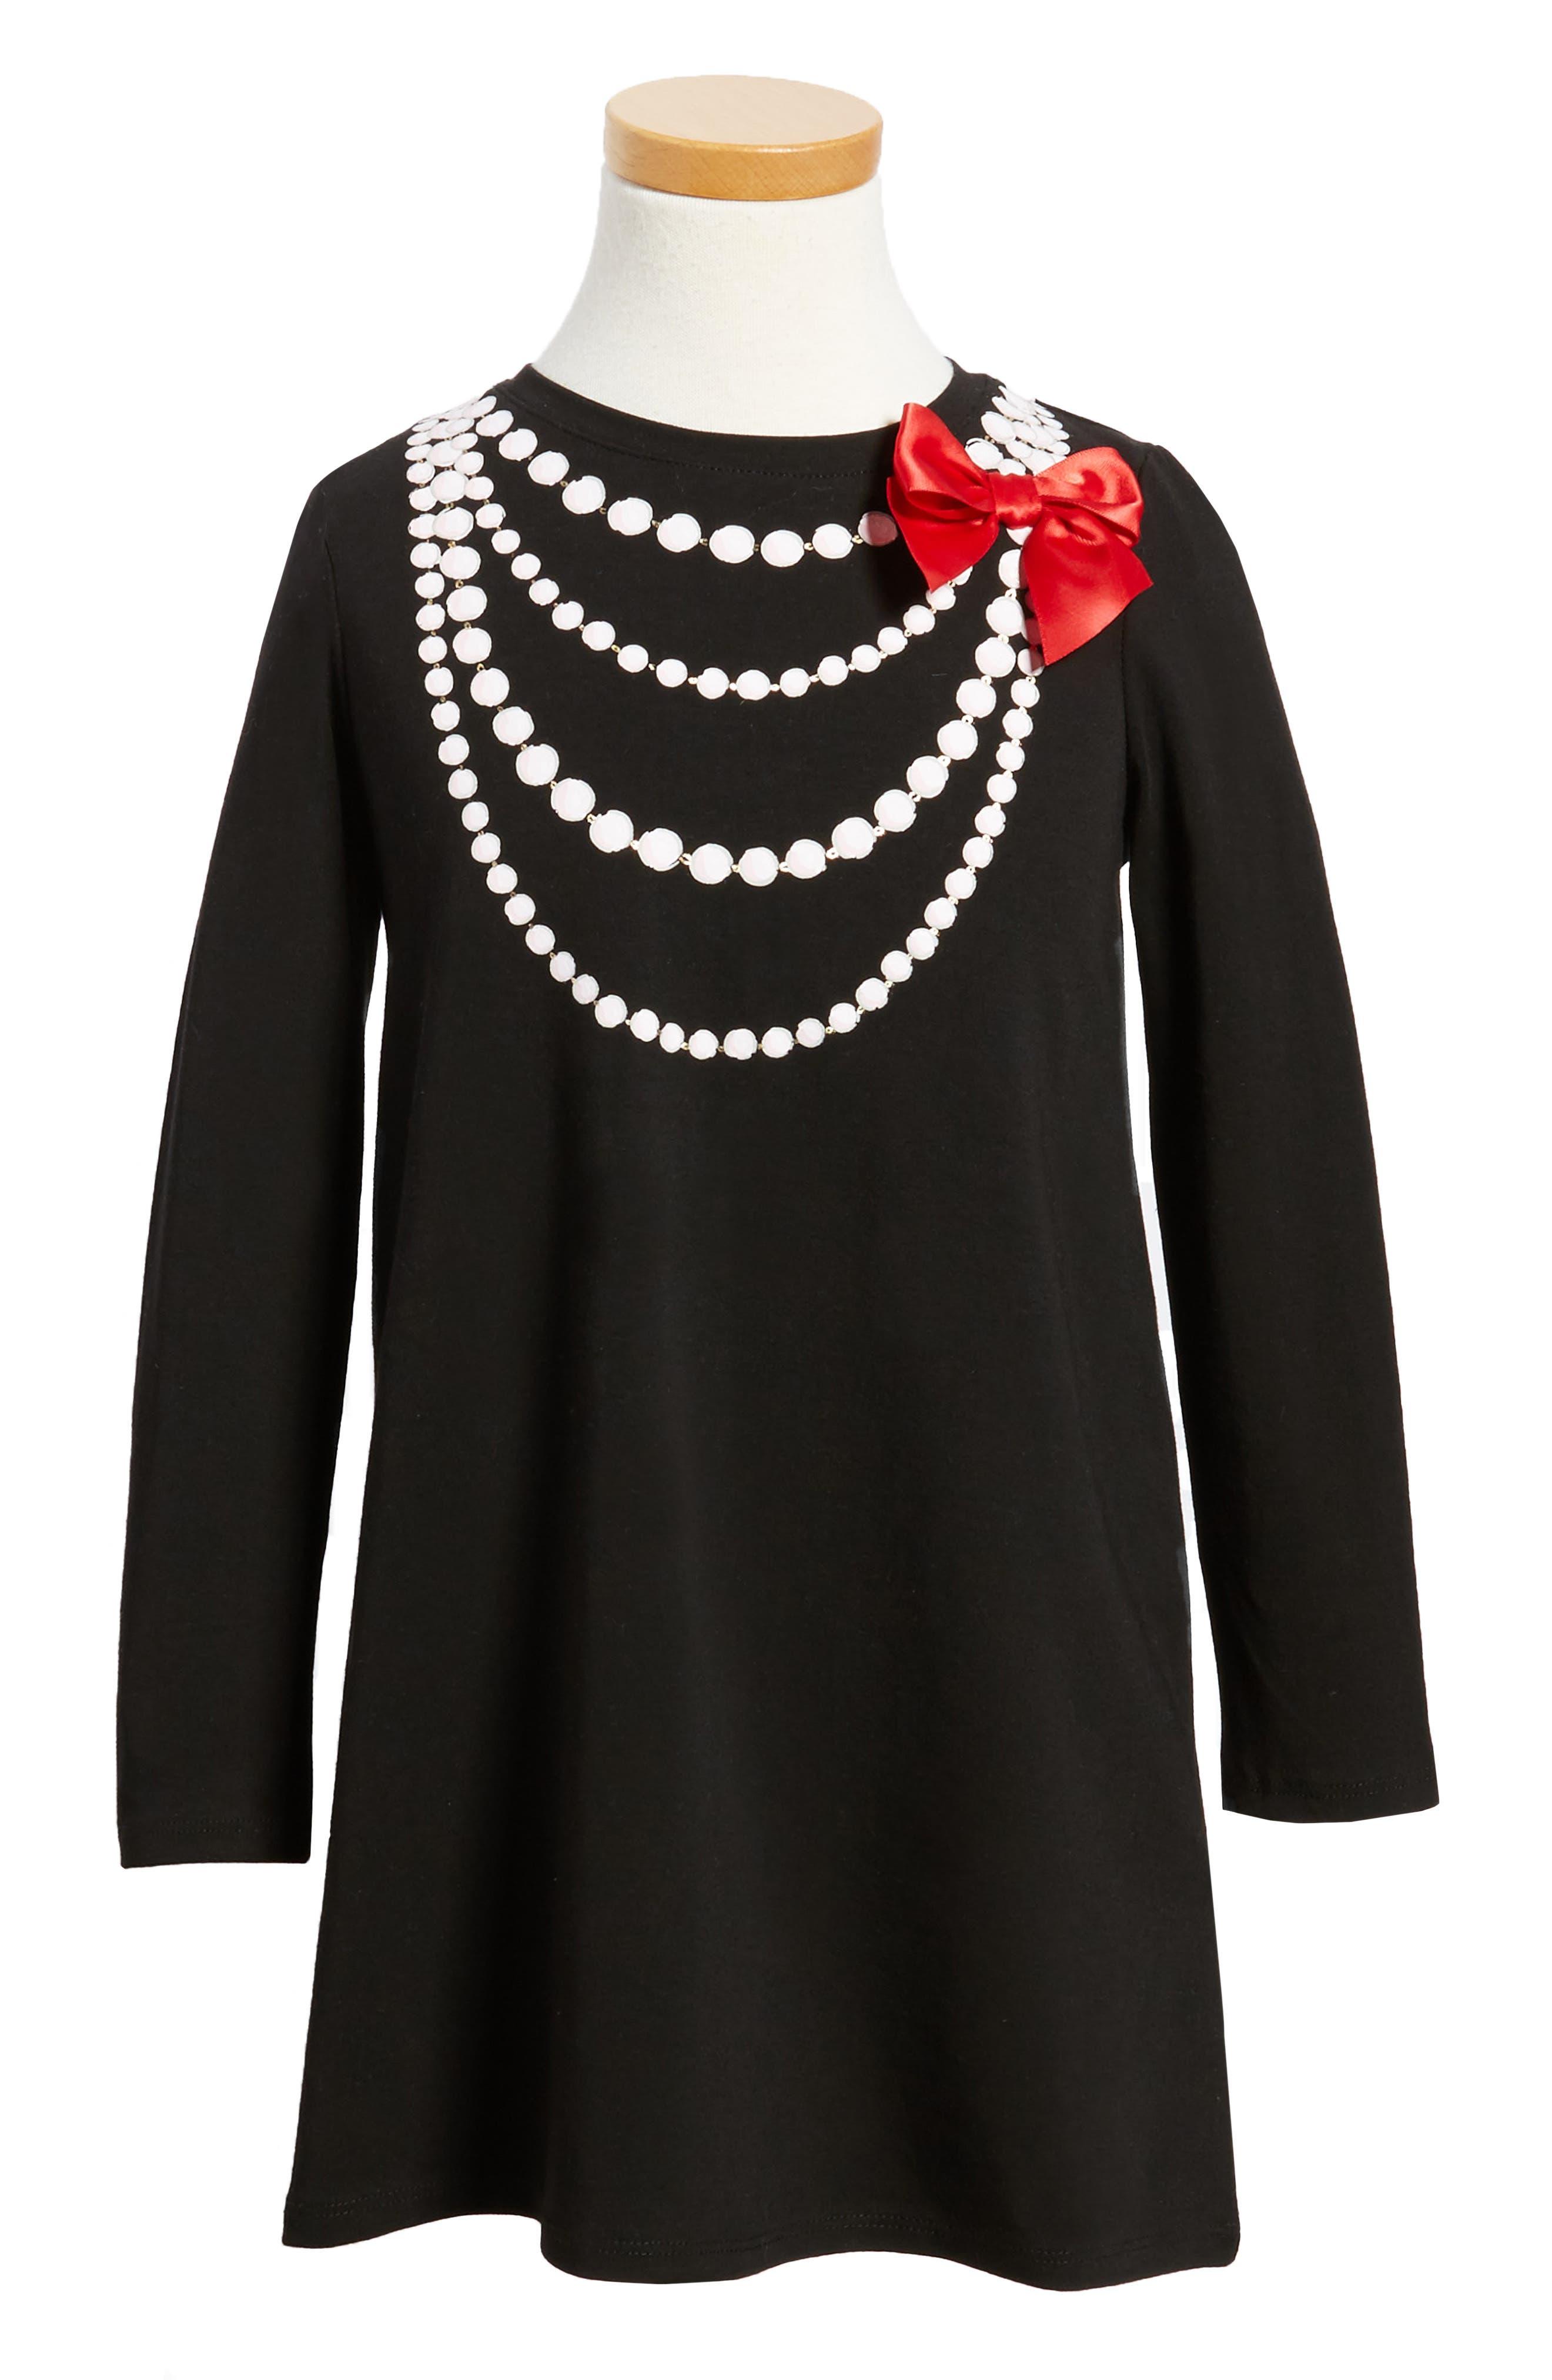 Main Image - kate spade new york trompe l'oeil dress (Toddler Girls & Little Girls)